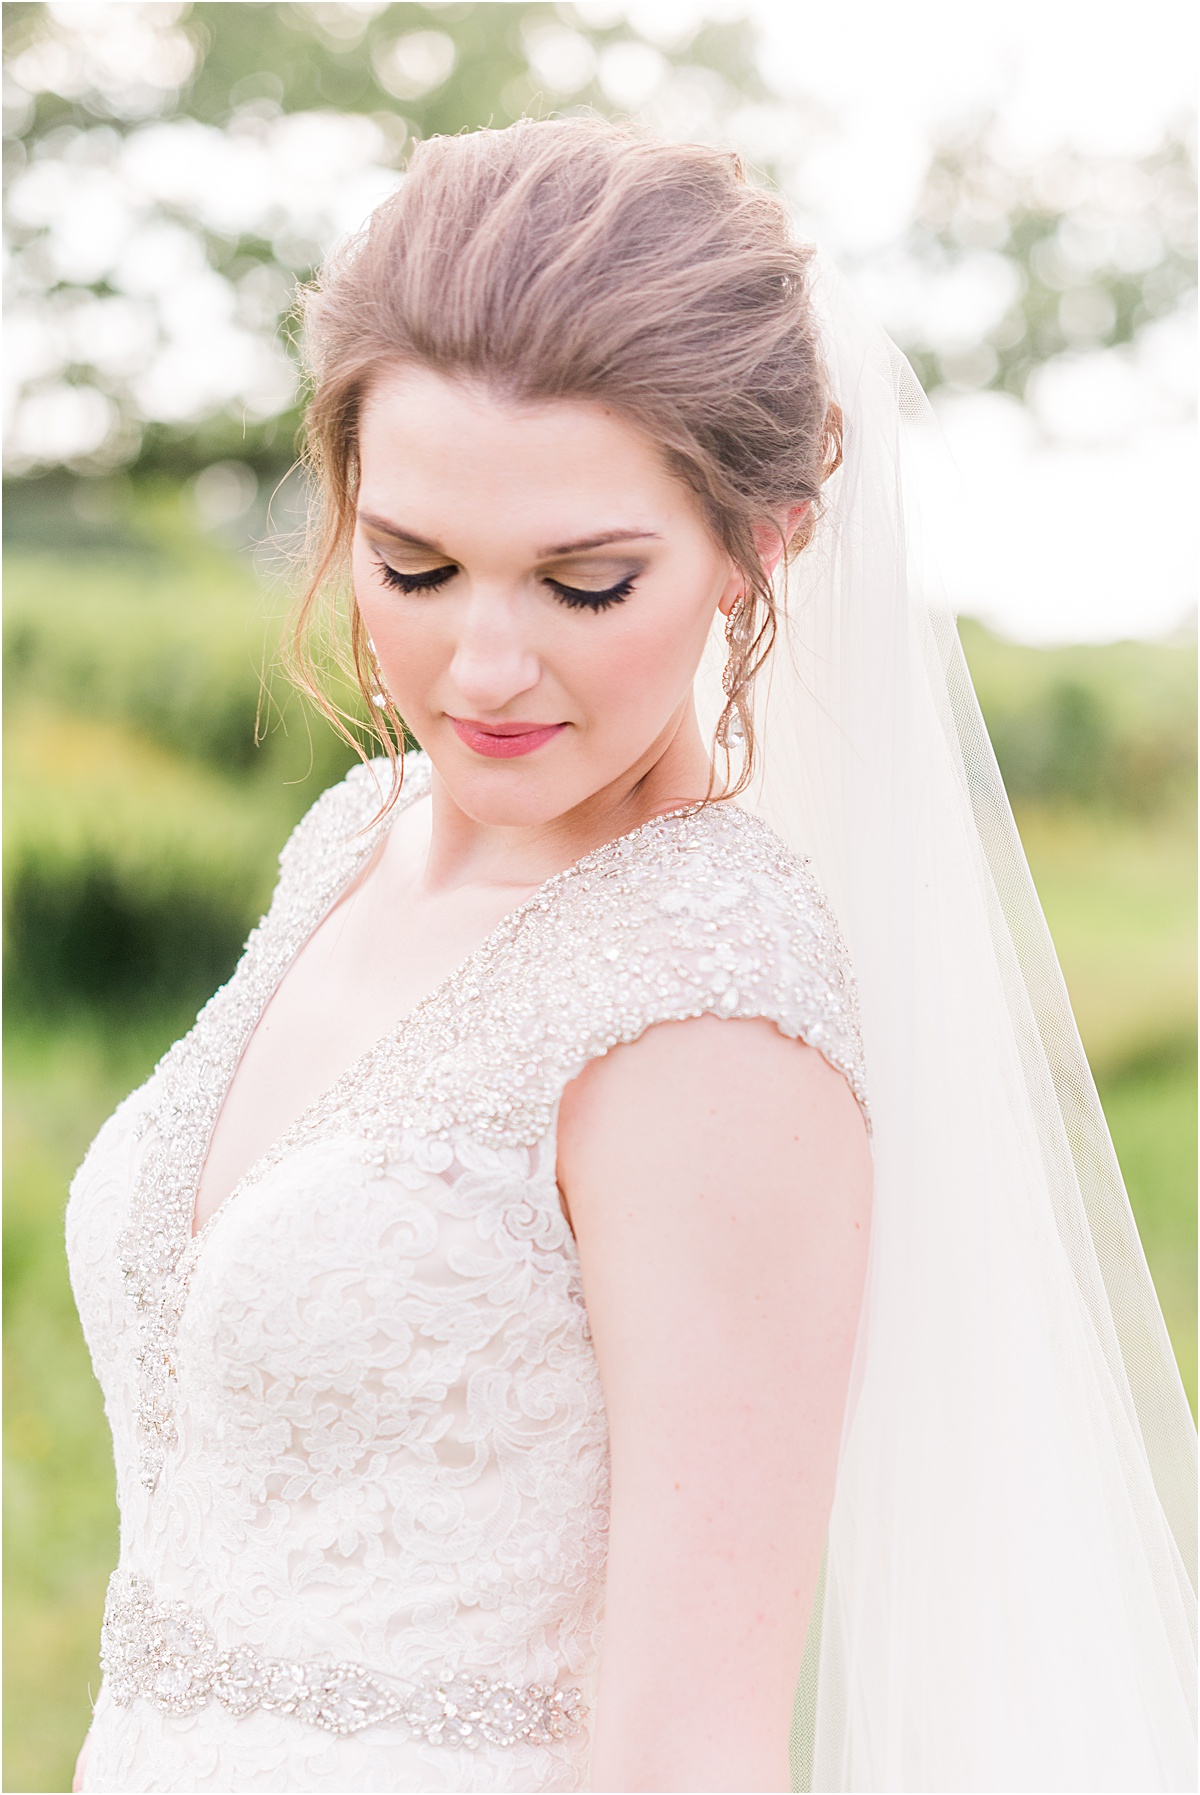 Light and airy wedding photographer